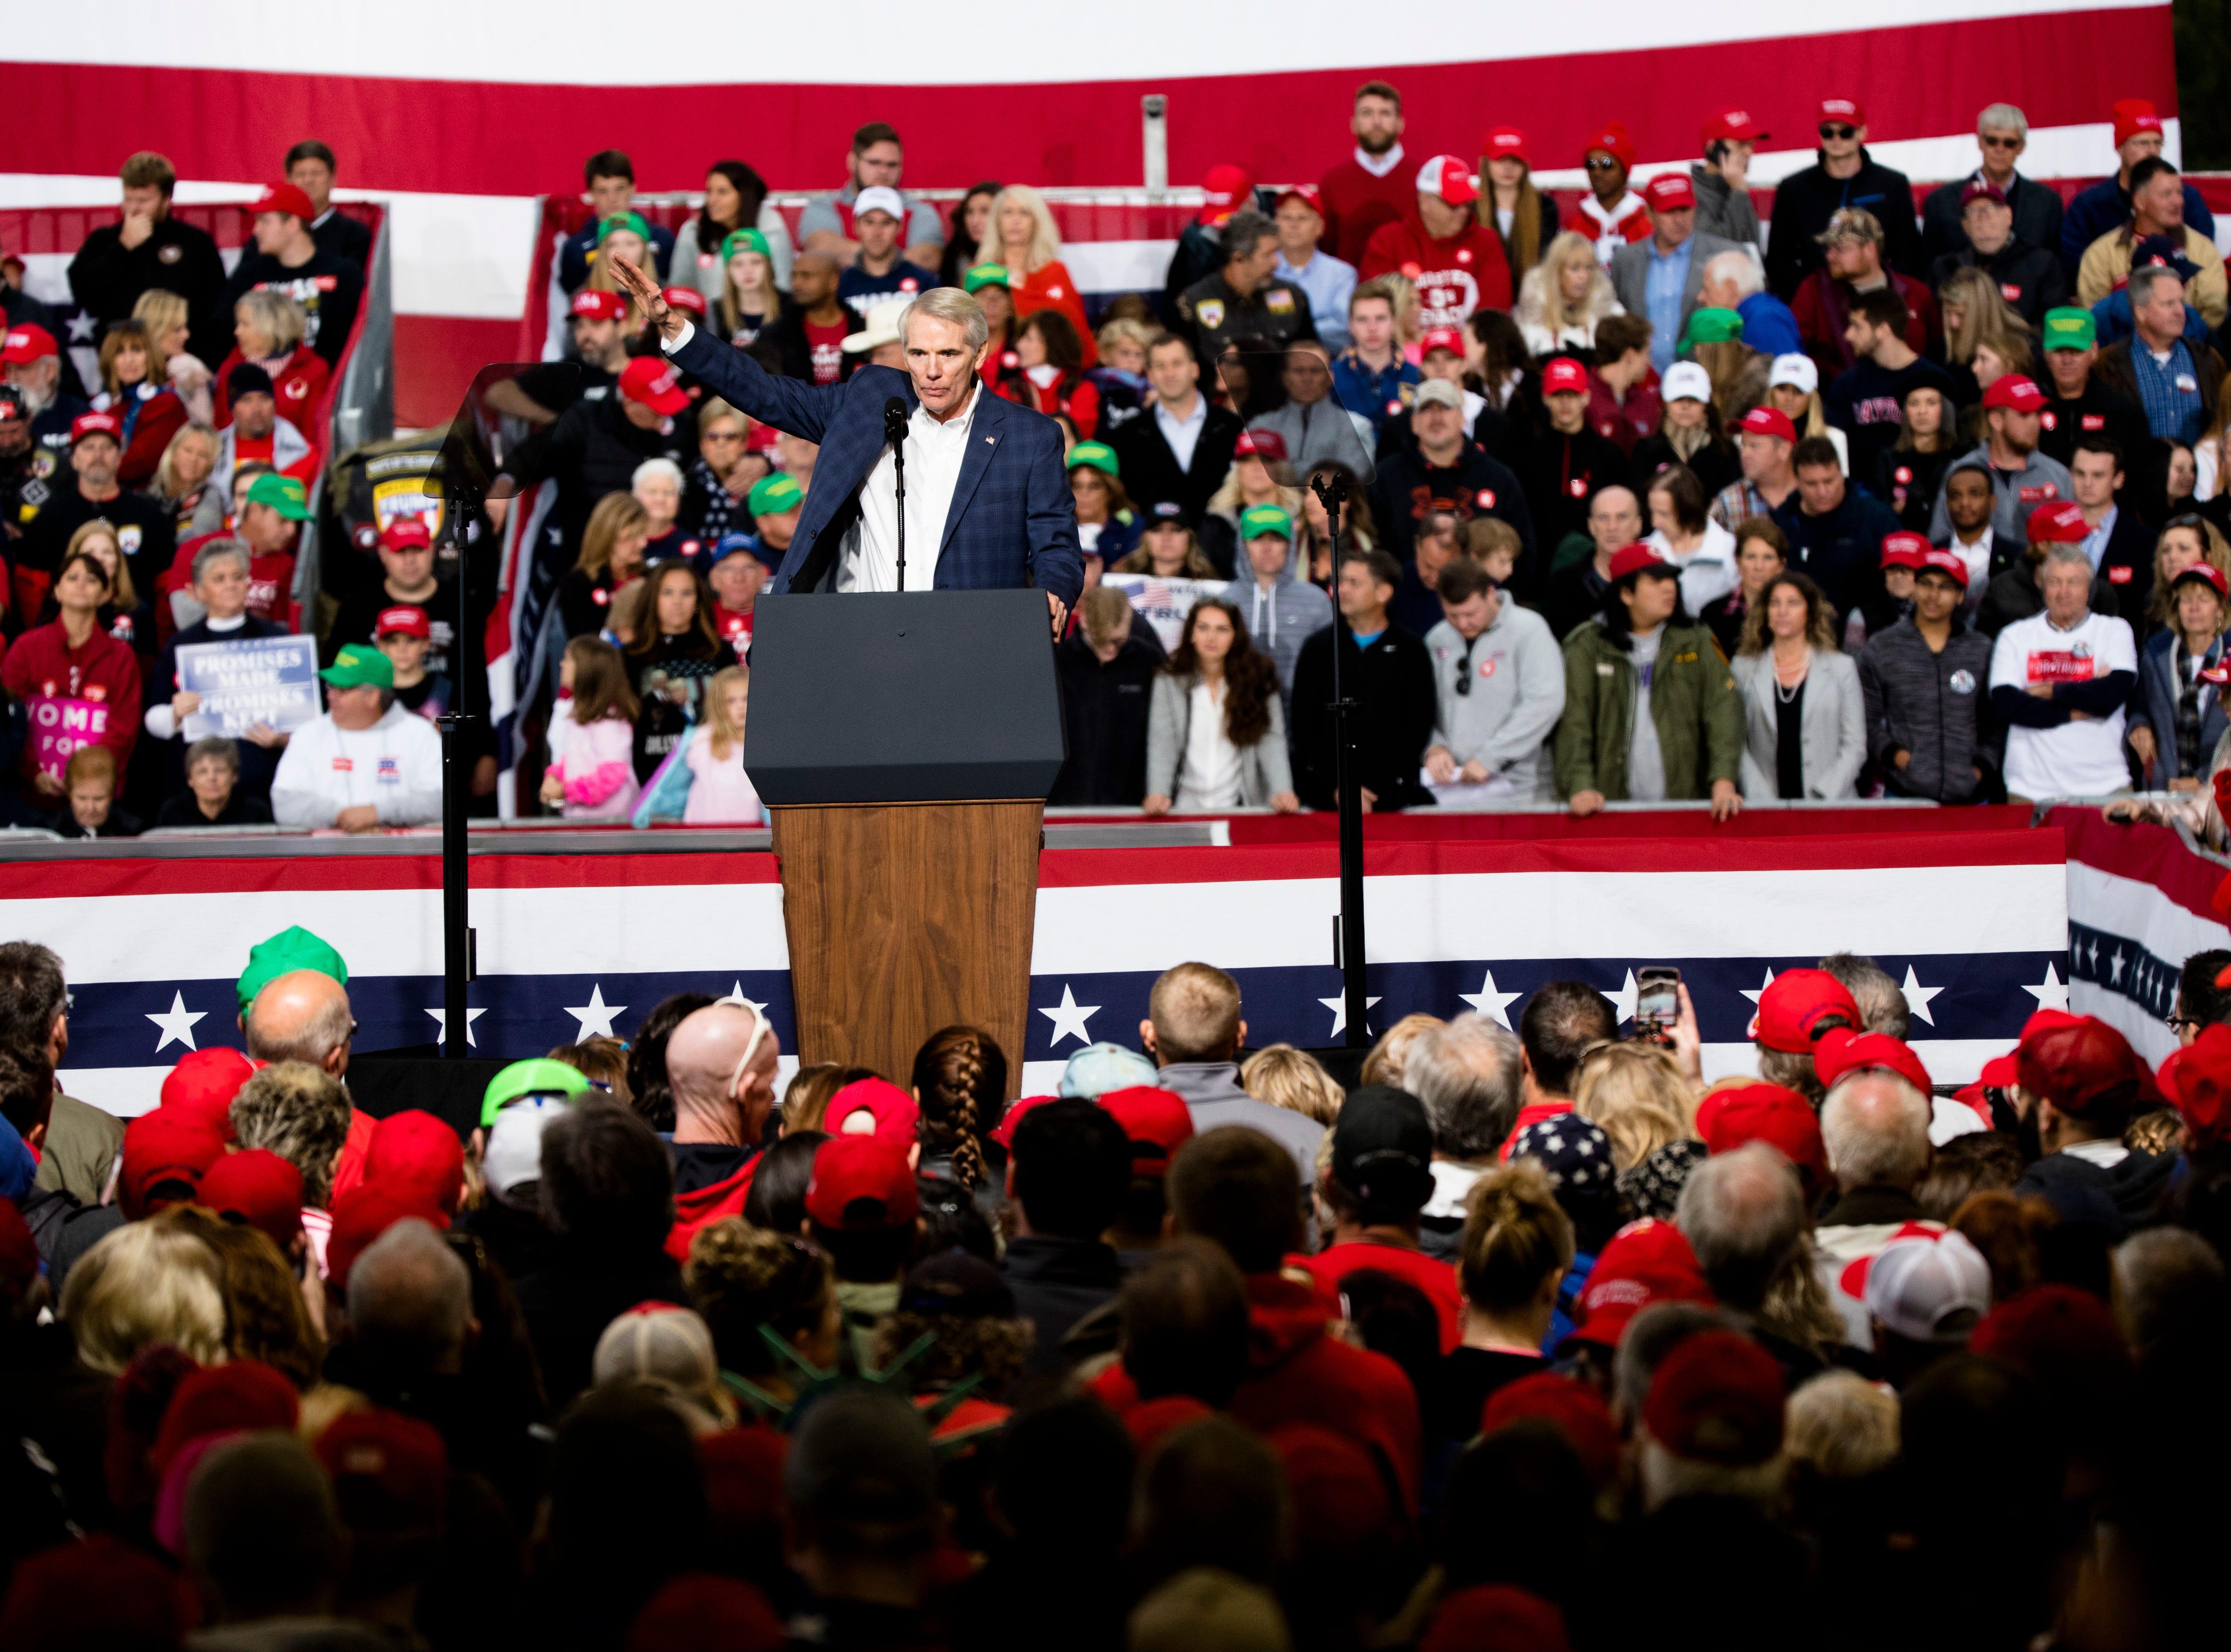 Senator Rob Portman speaks during President Donald J. Trump's Make America Great Again Rally in Lebanon, Ohio, on Friday, Oct. 12, 2018.